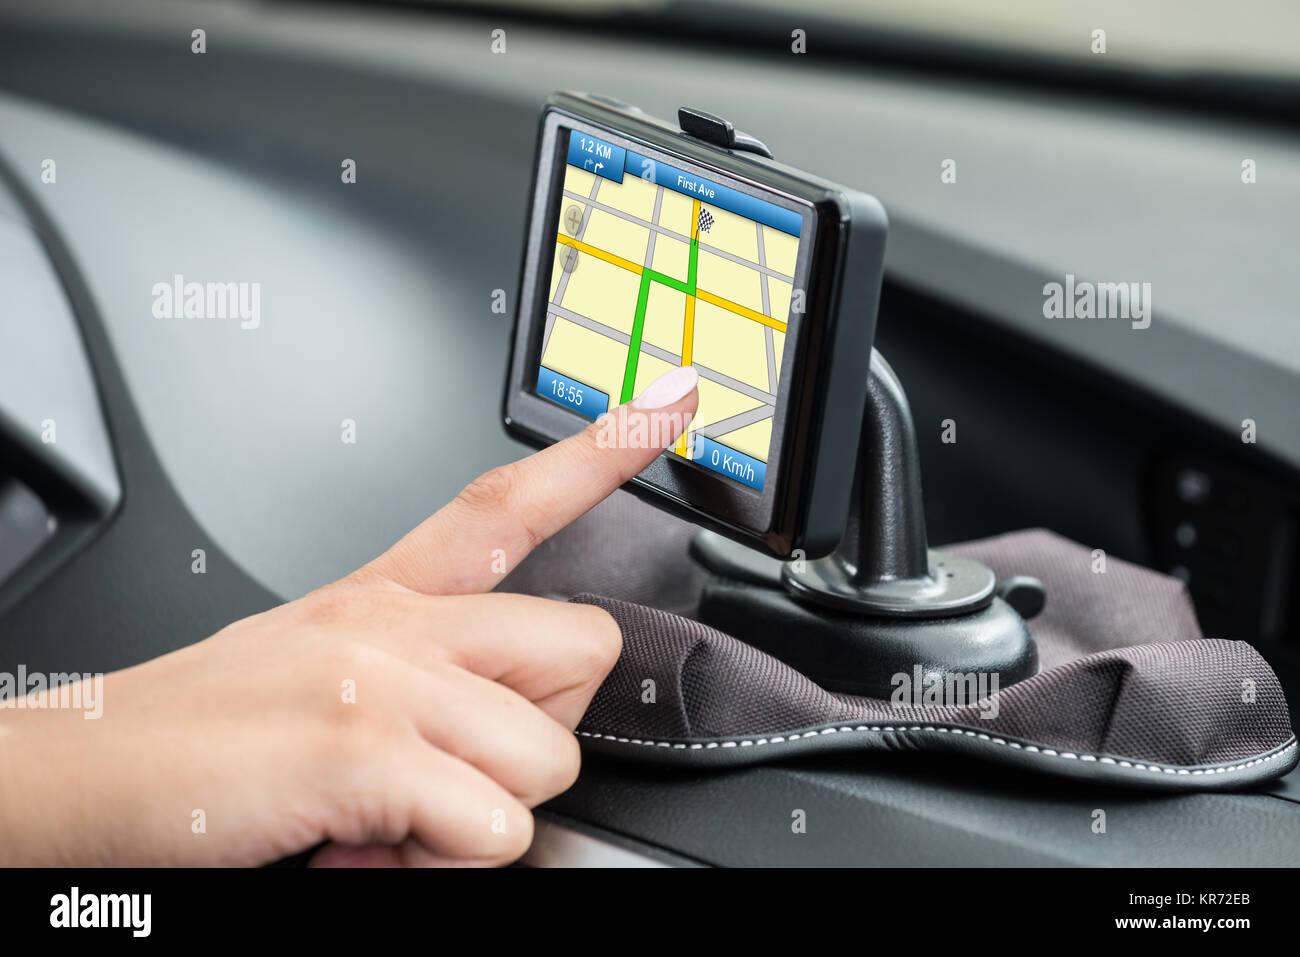 Female's Hand Using GPS Navigation - Stock Image